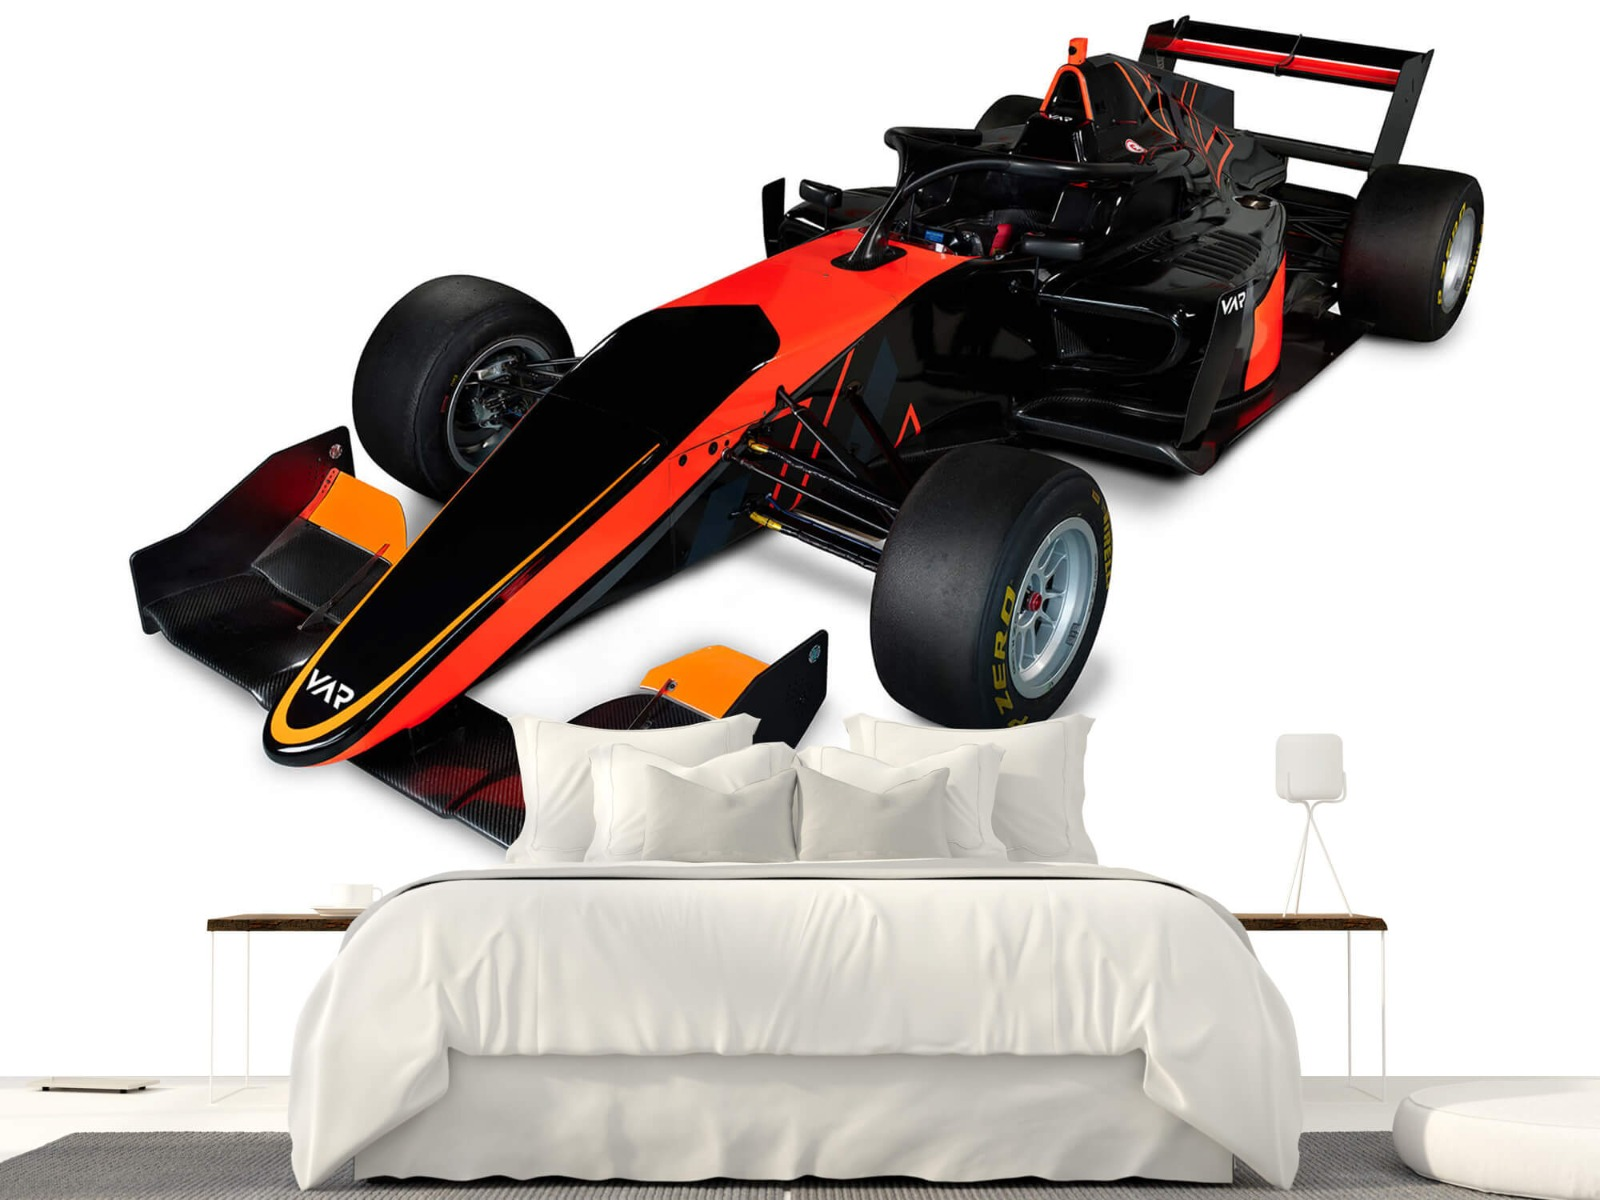 Sportauto's - Formula 3 - Left front view, 3d - Computerruimte 23